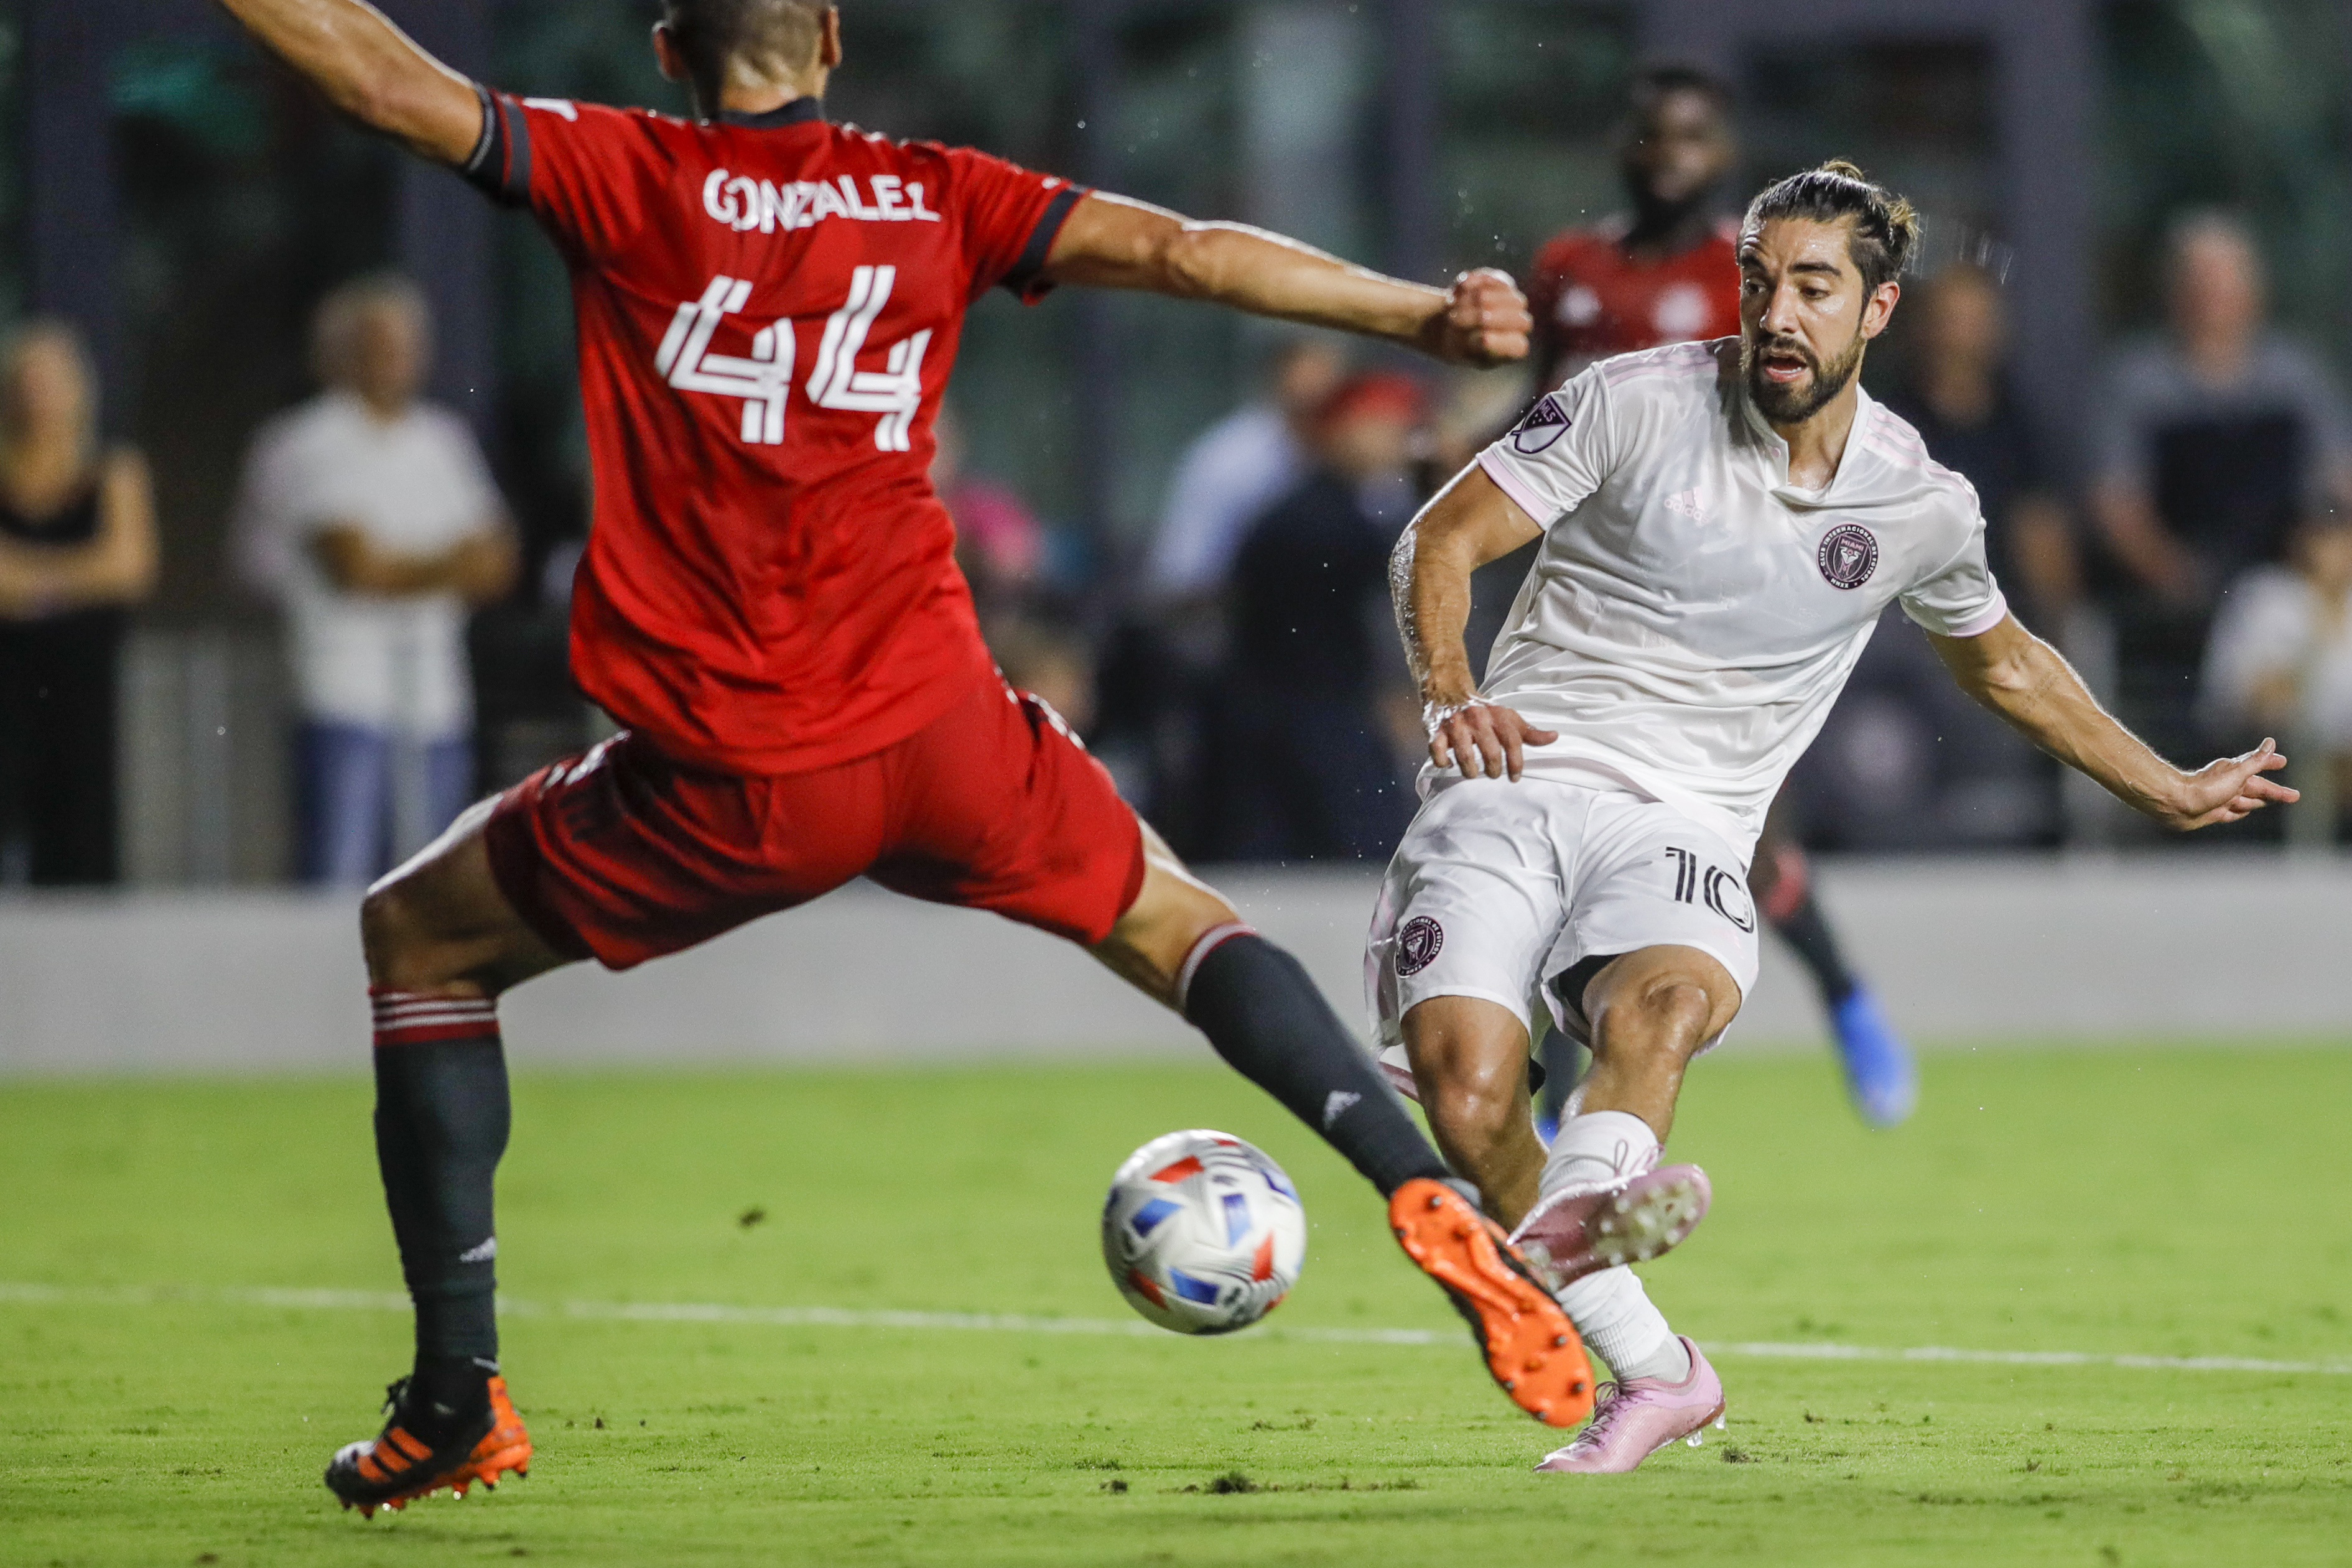 MLS: Toronto FC at Inter Miami CF